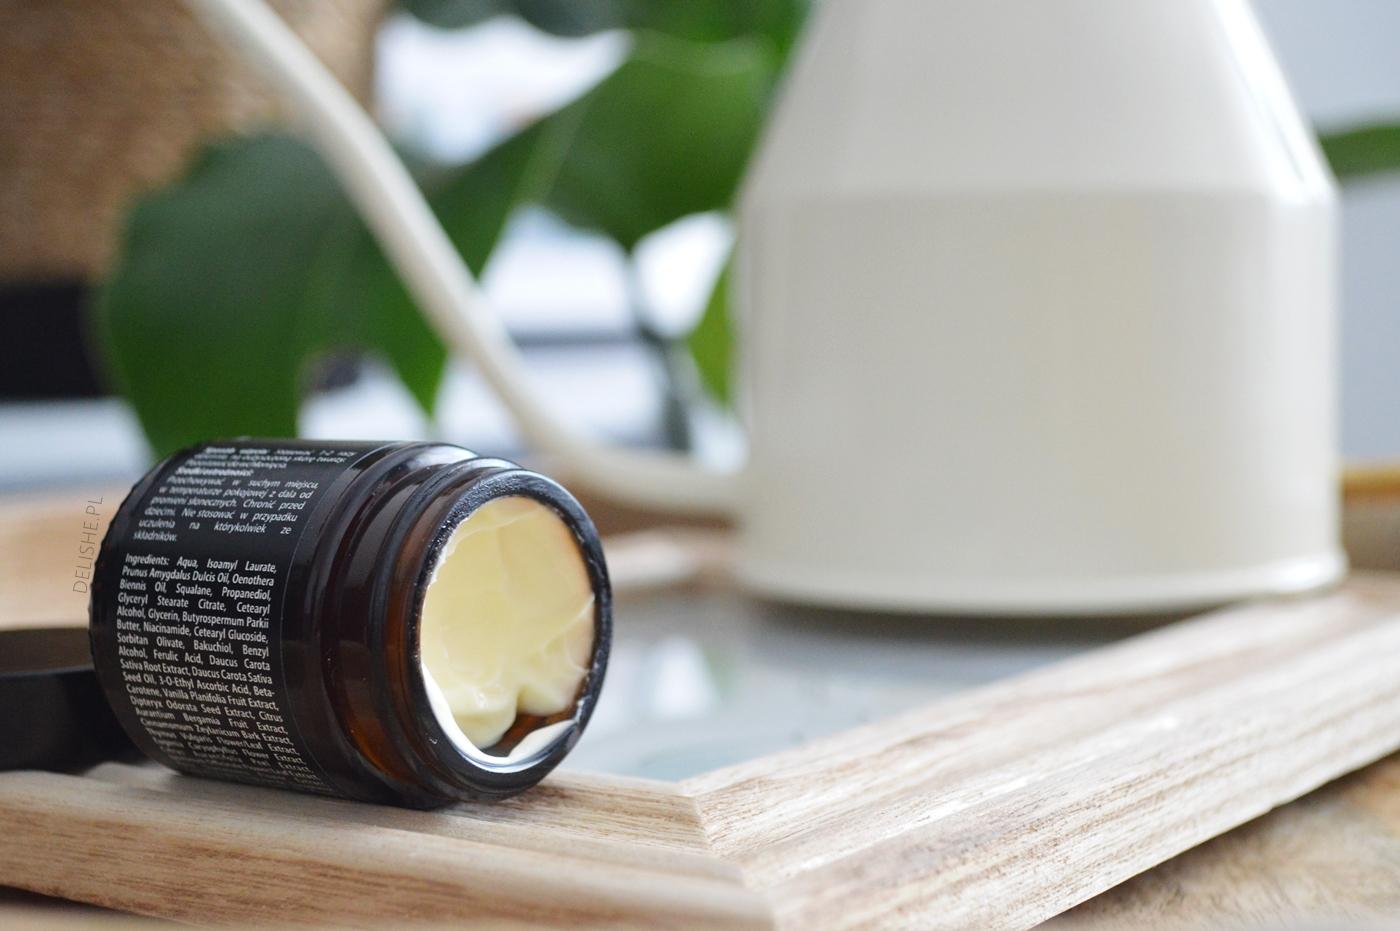 krem z bakuchiolem KOI Cosmetics